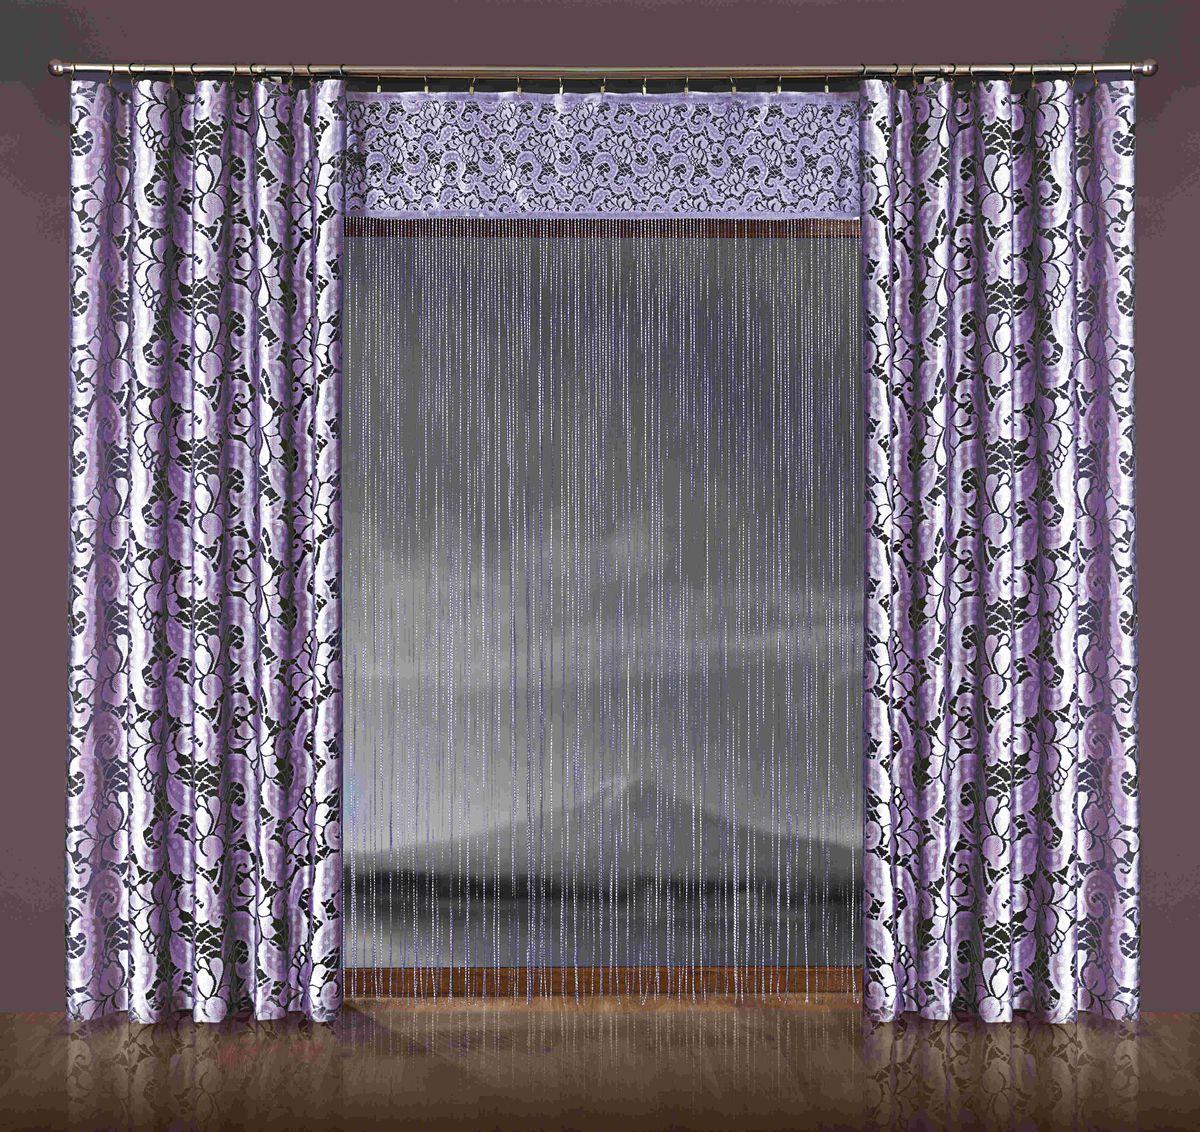 Комплект штор WISAN 170*250+150*250*2. 077W077WКомплект штор WISAN 170*250+150*250*2. 077W Материал: 100% п/э, размер: 170*250+150*250*2, цвет: лиловый